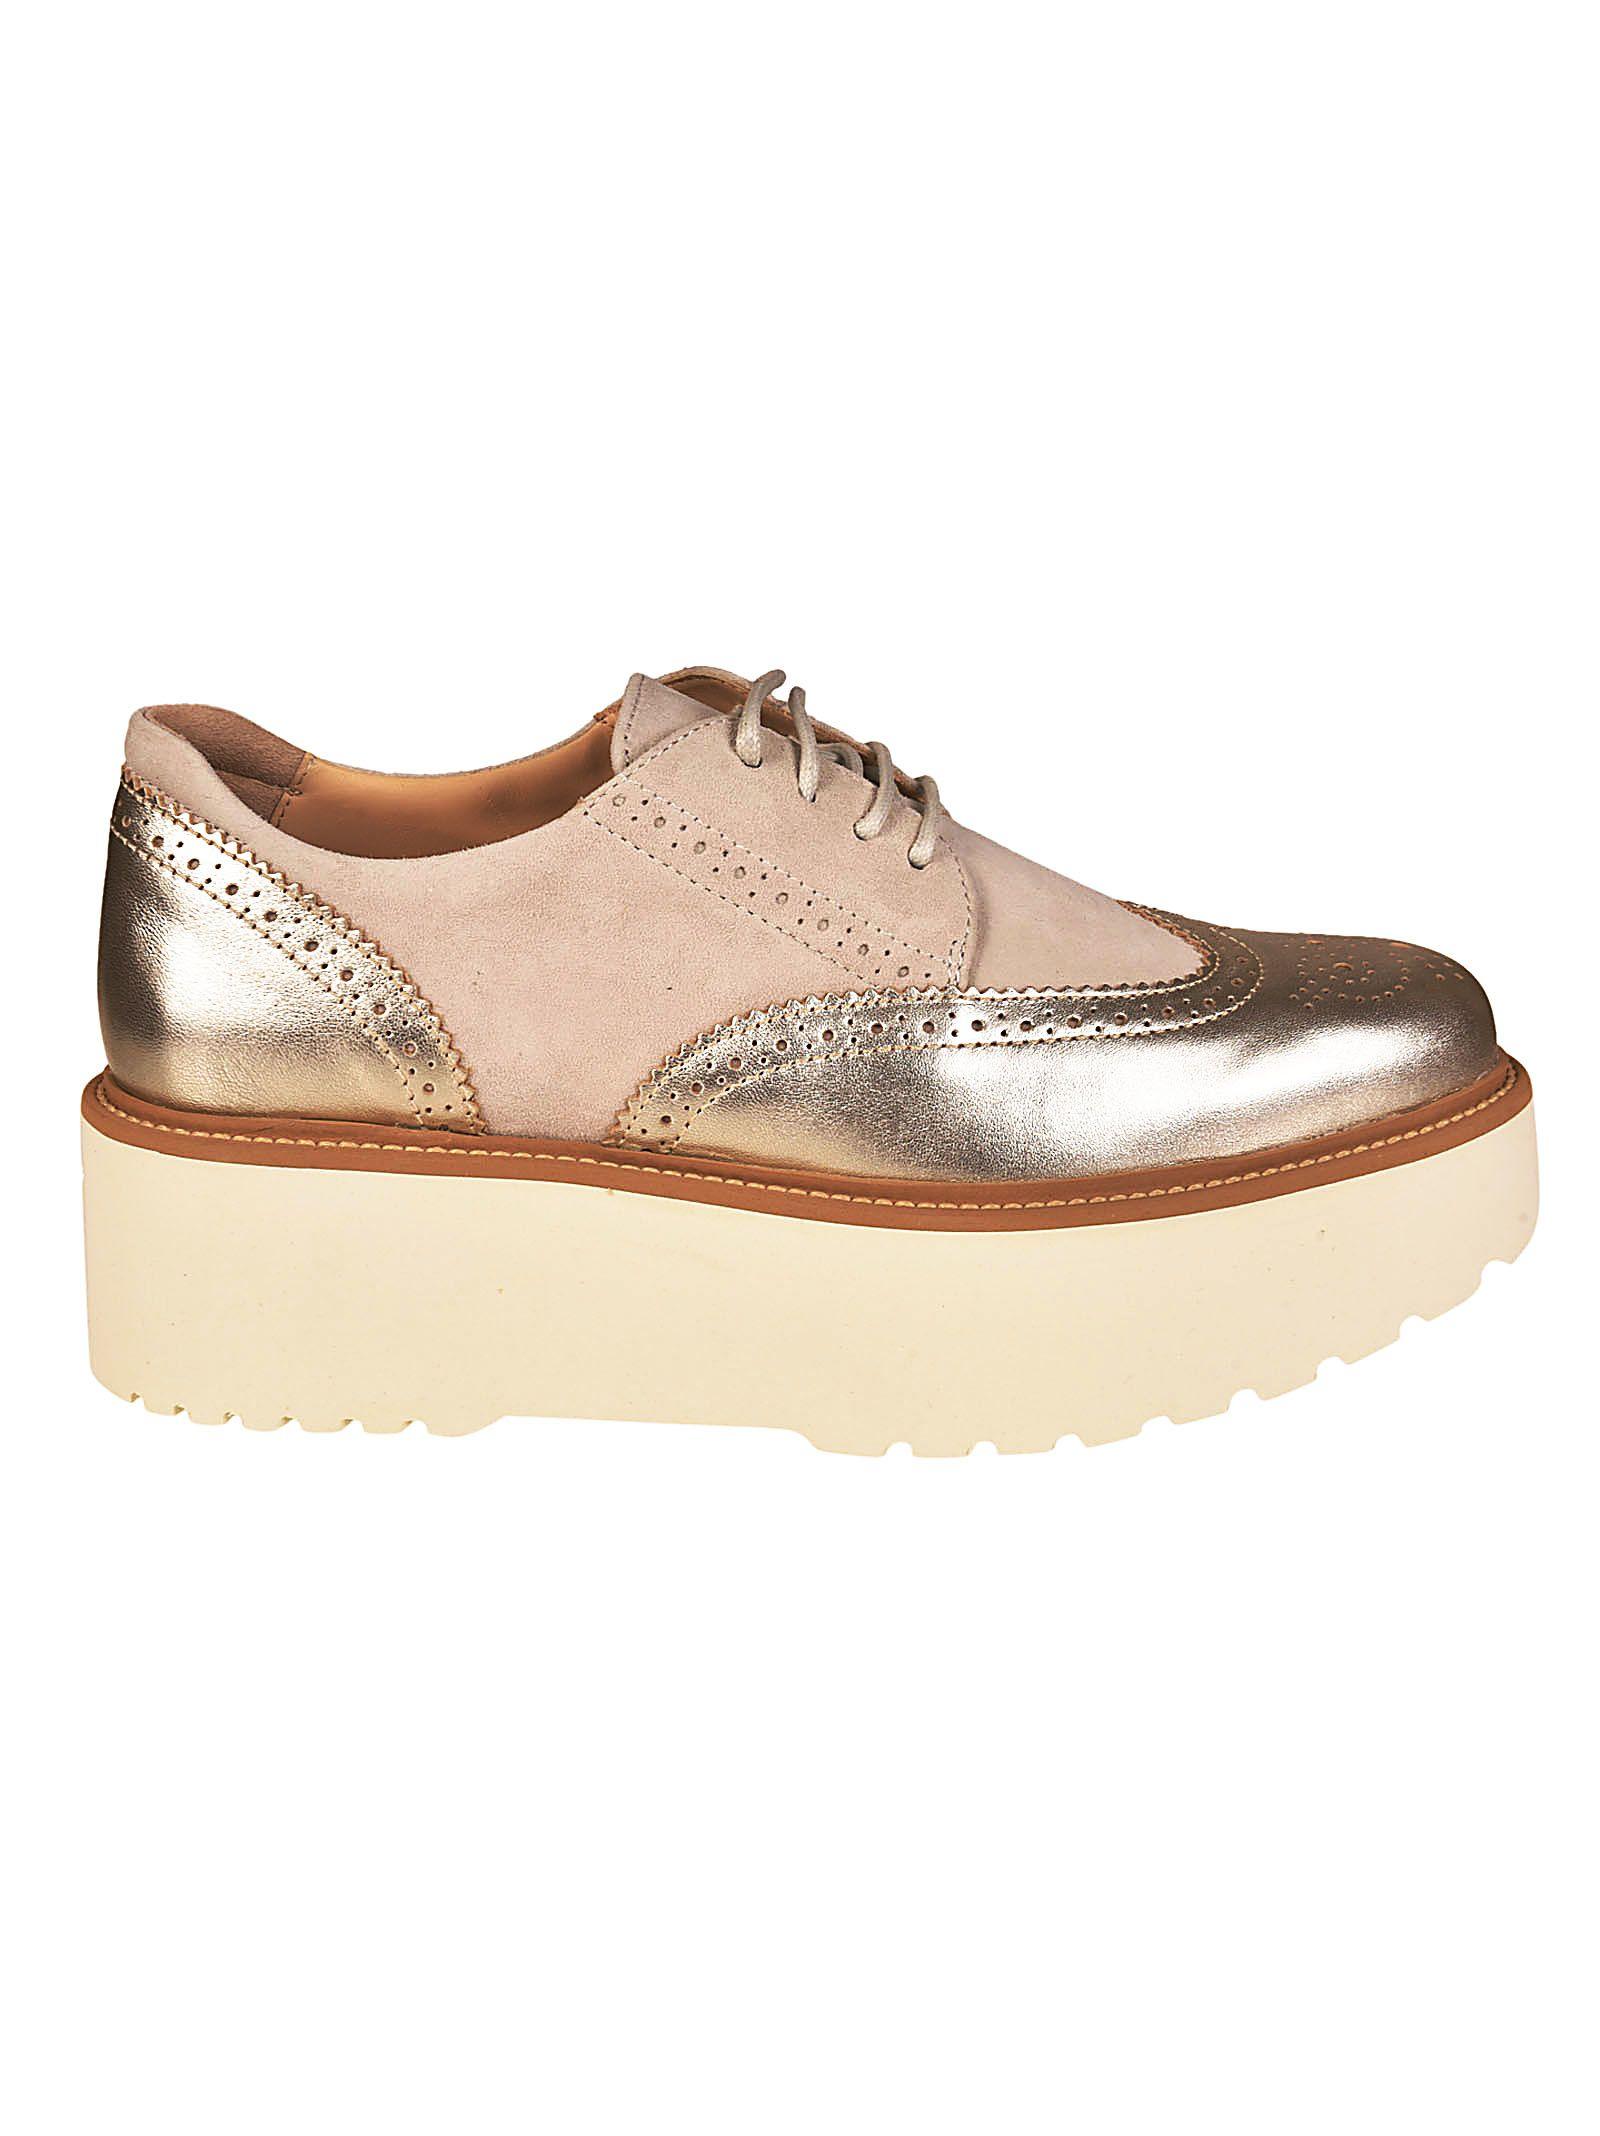 Hogan H355 Brogues Platform Sneakers